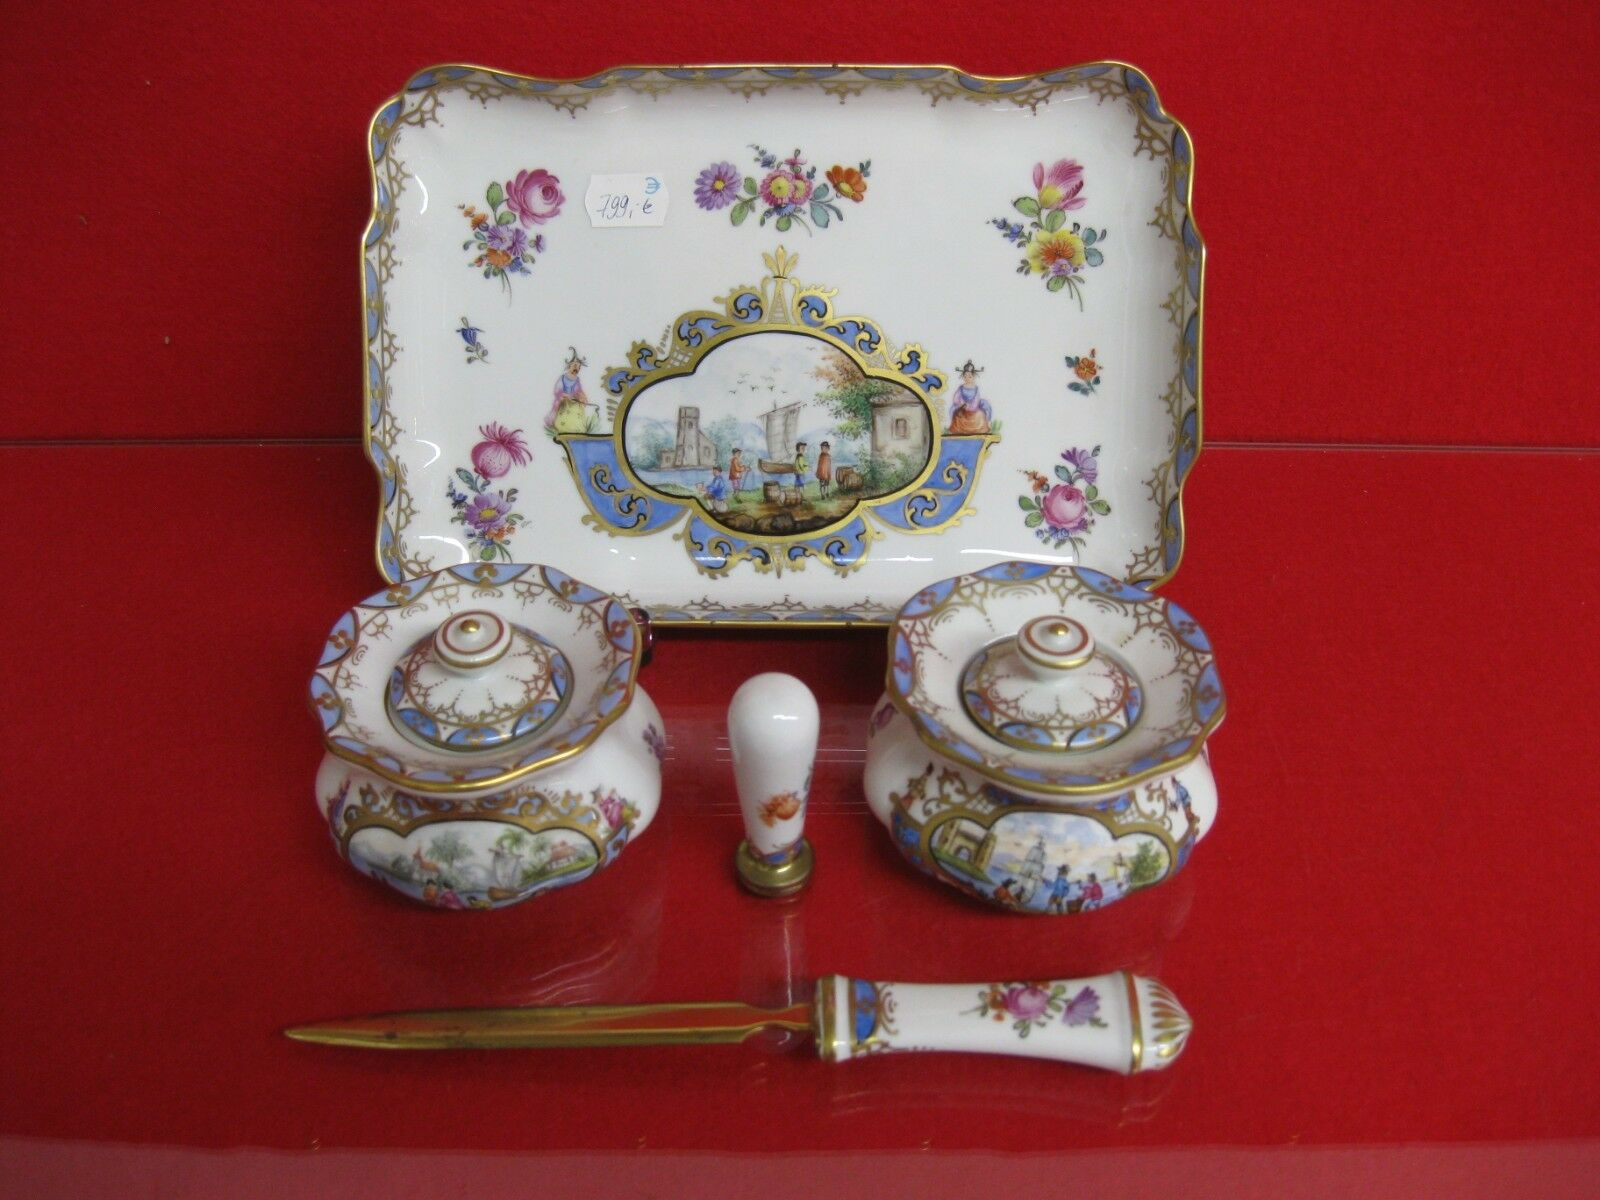 Dresde potschappel porcelana escritorio set kauffahrtei kaendler tintero